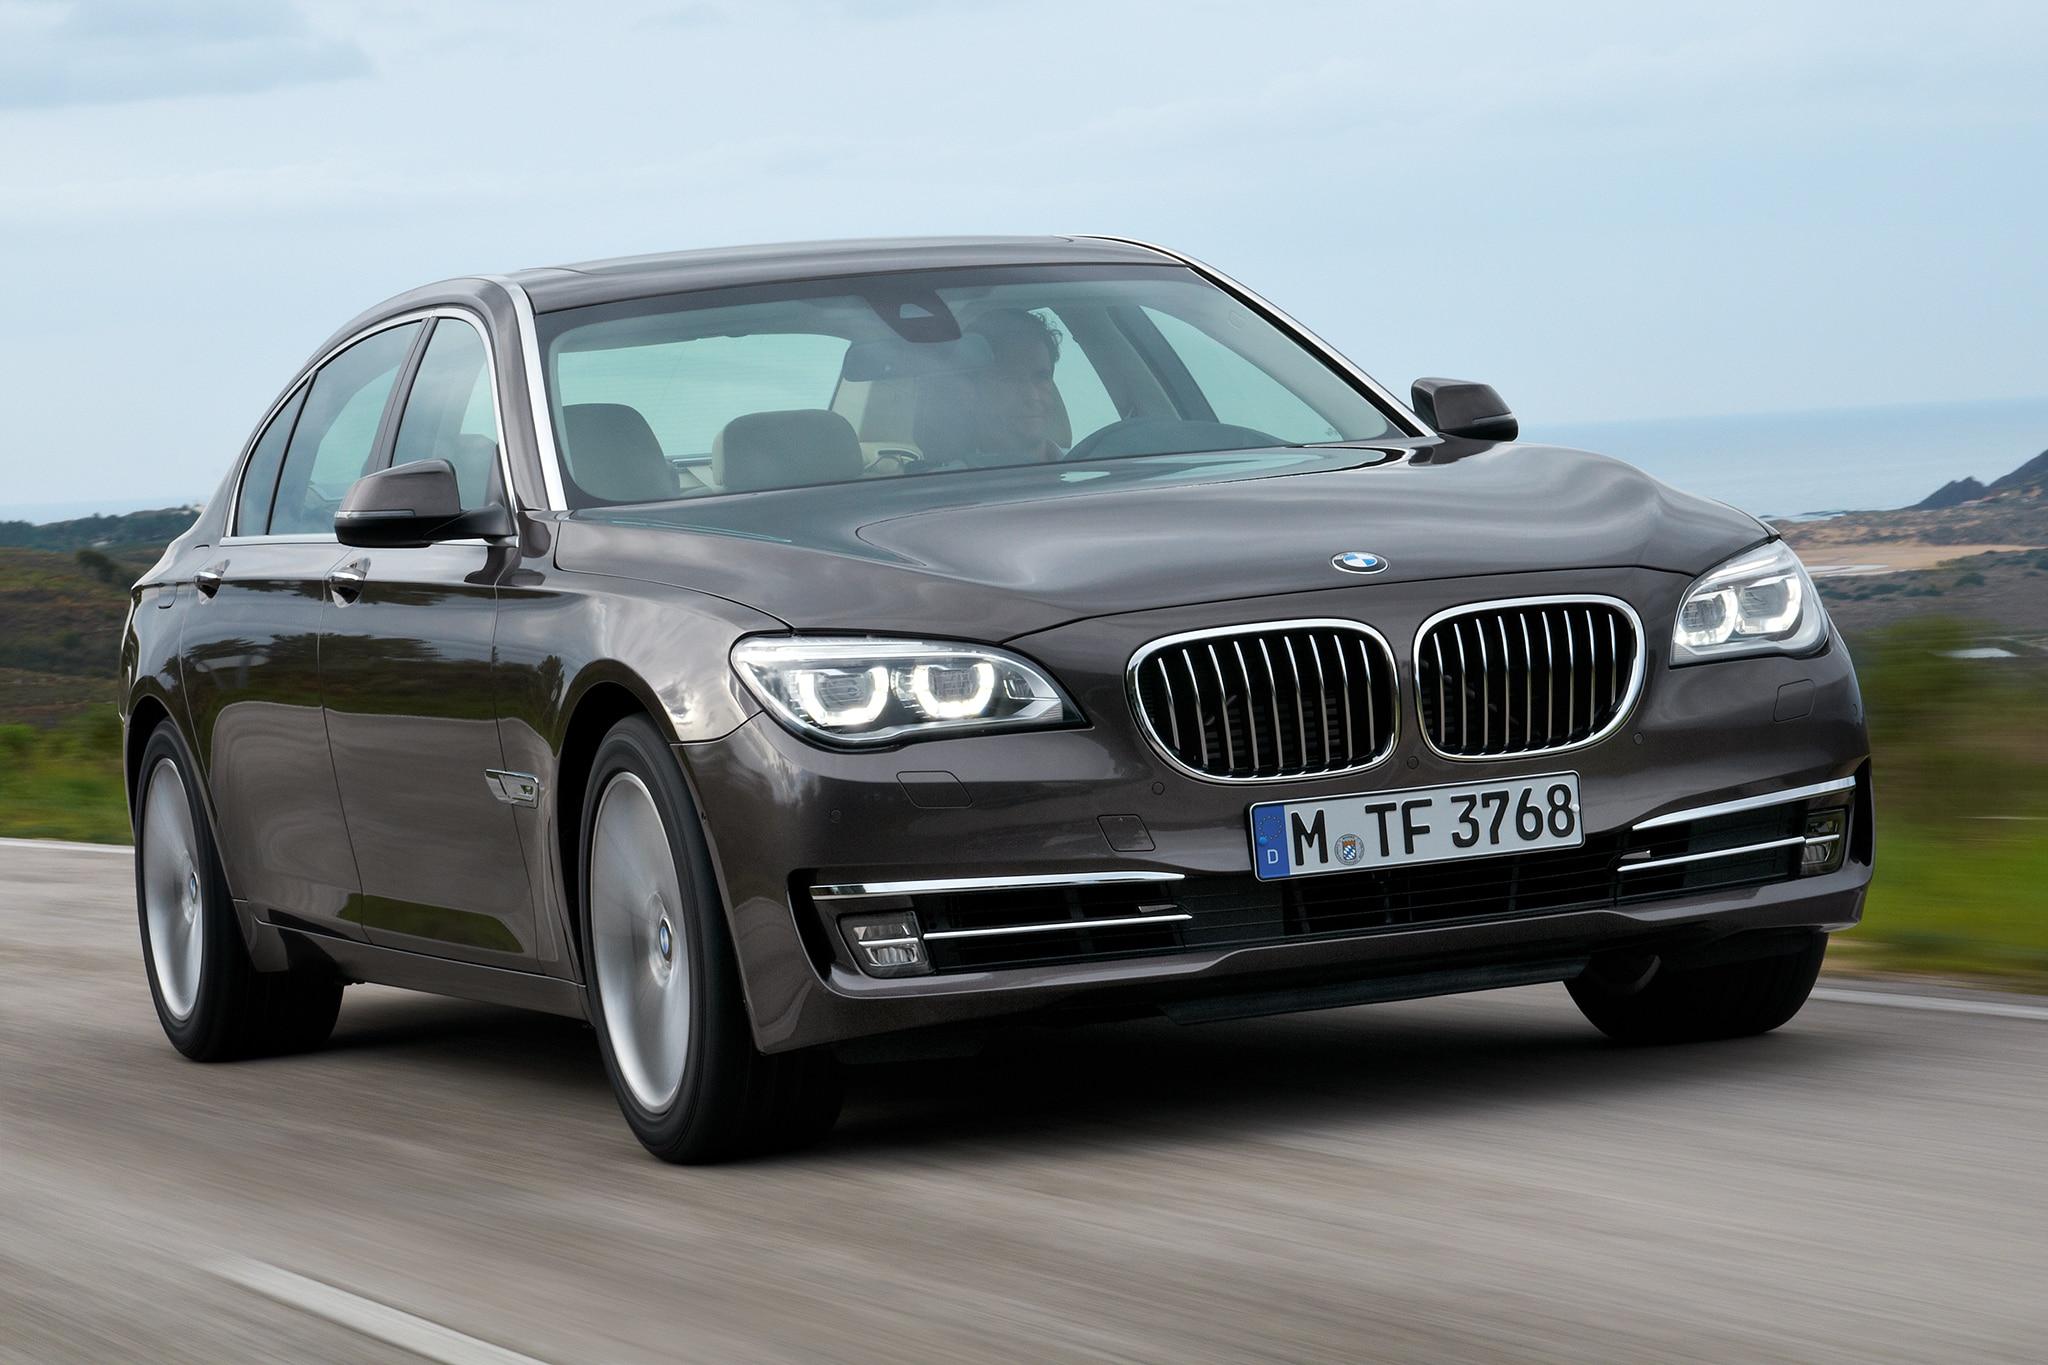 2014 BMW 7 Series Passengers Three Quarters In Motion1